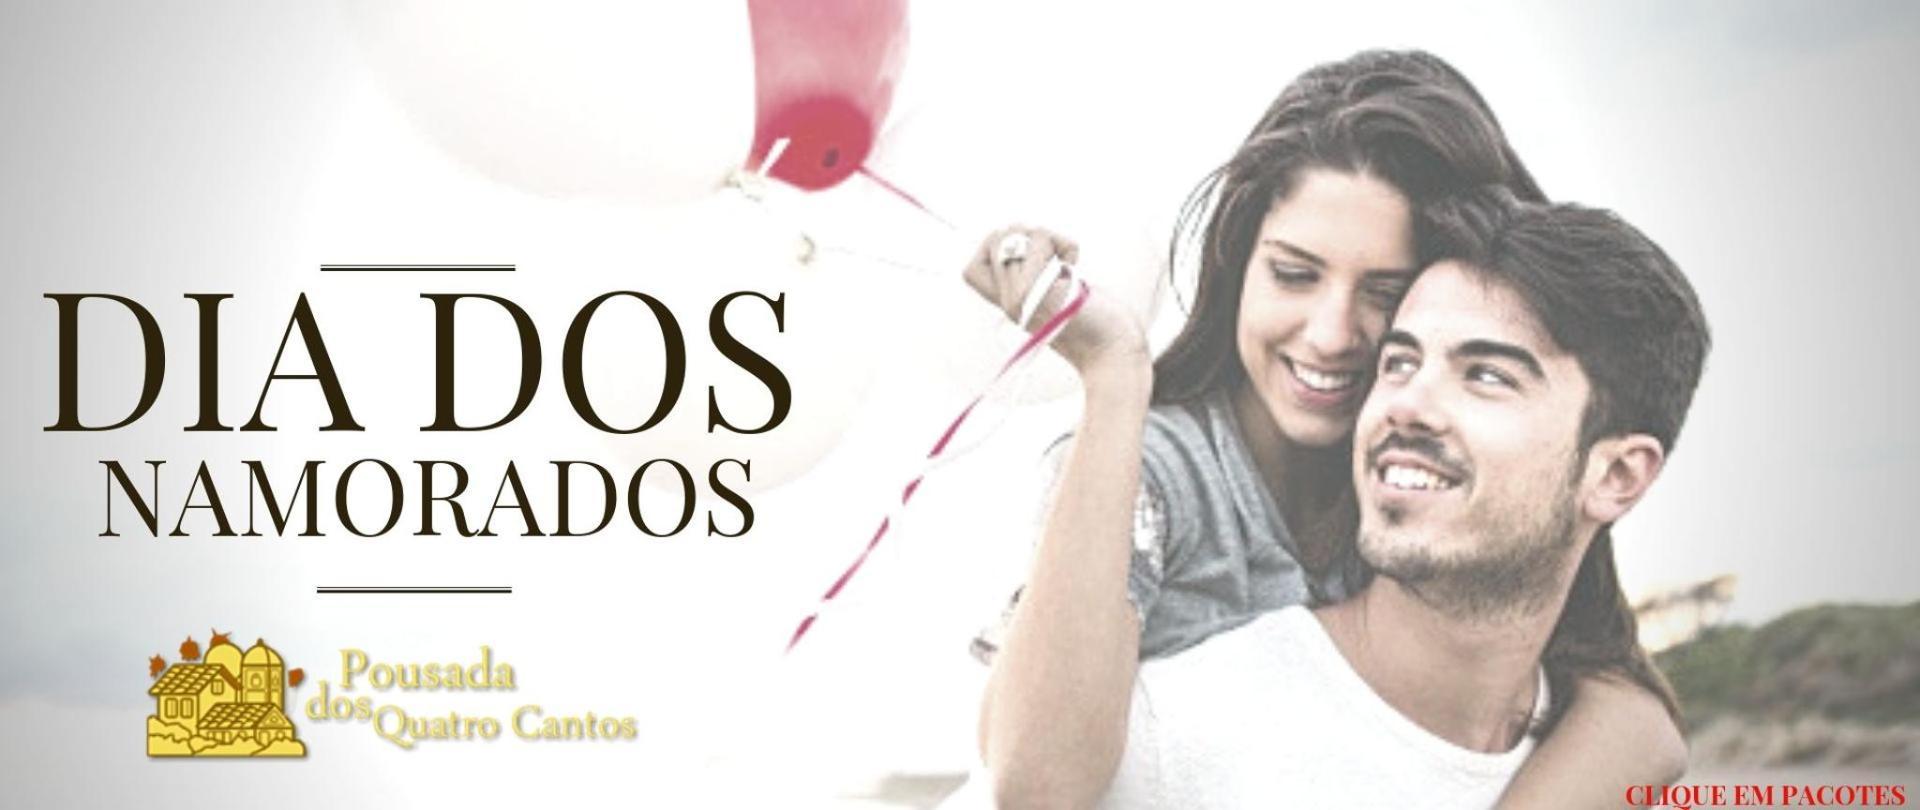 NAMORADOS (2).jpg